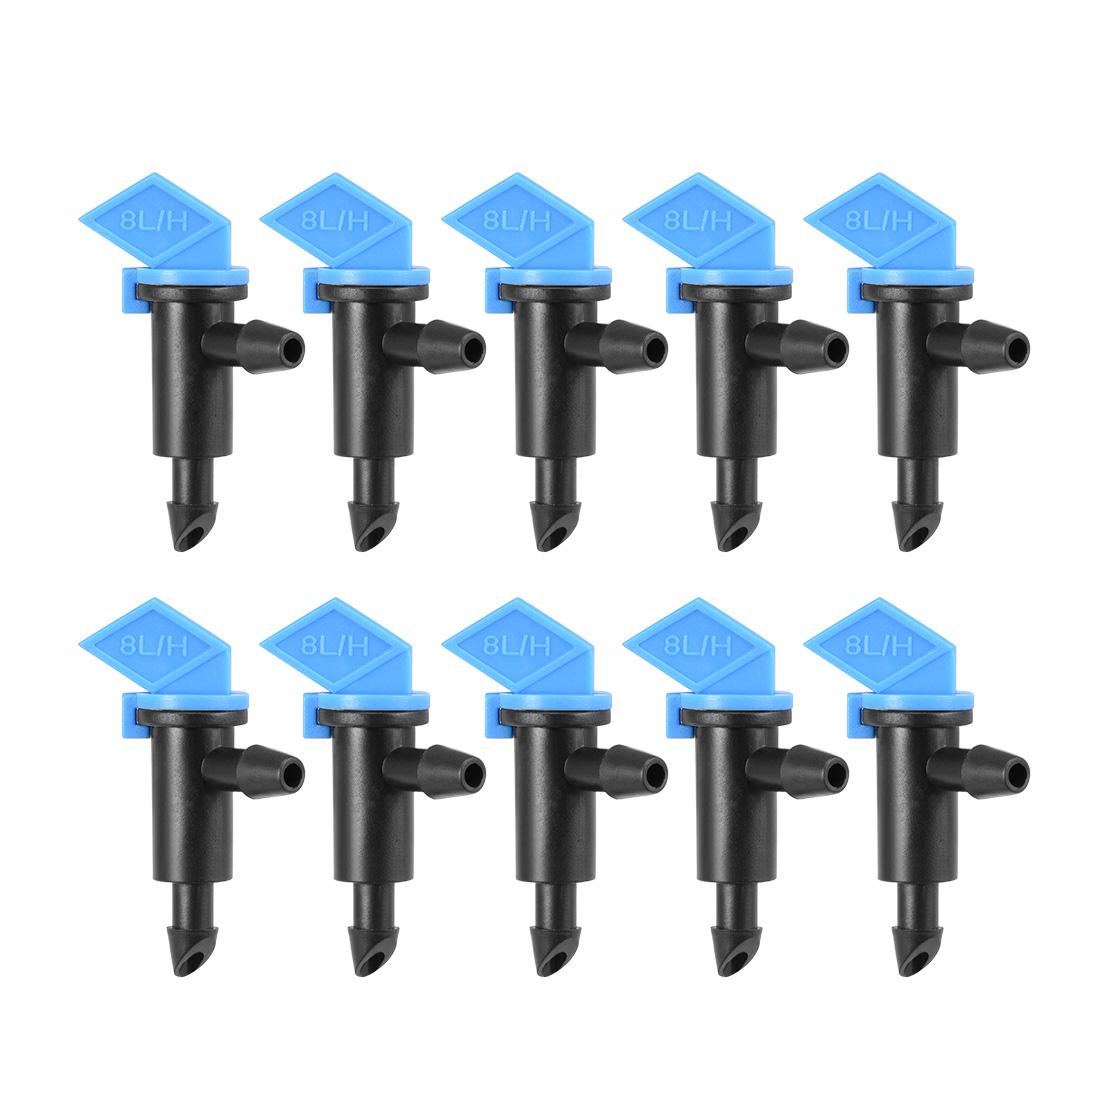 Flag Dripper 2 GPH 8L/H Emitter Sprinkler Lawn Drip Irrigation 4/7mm Hose 10pcs